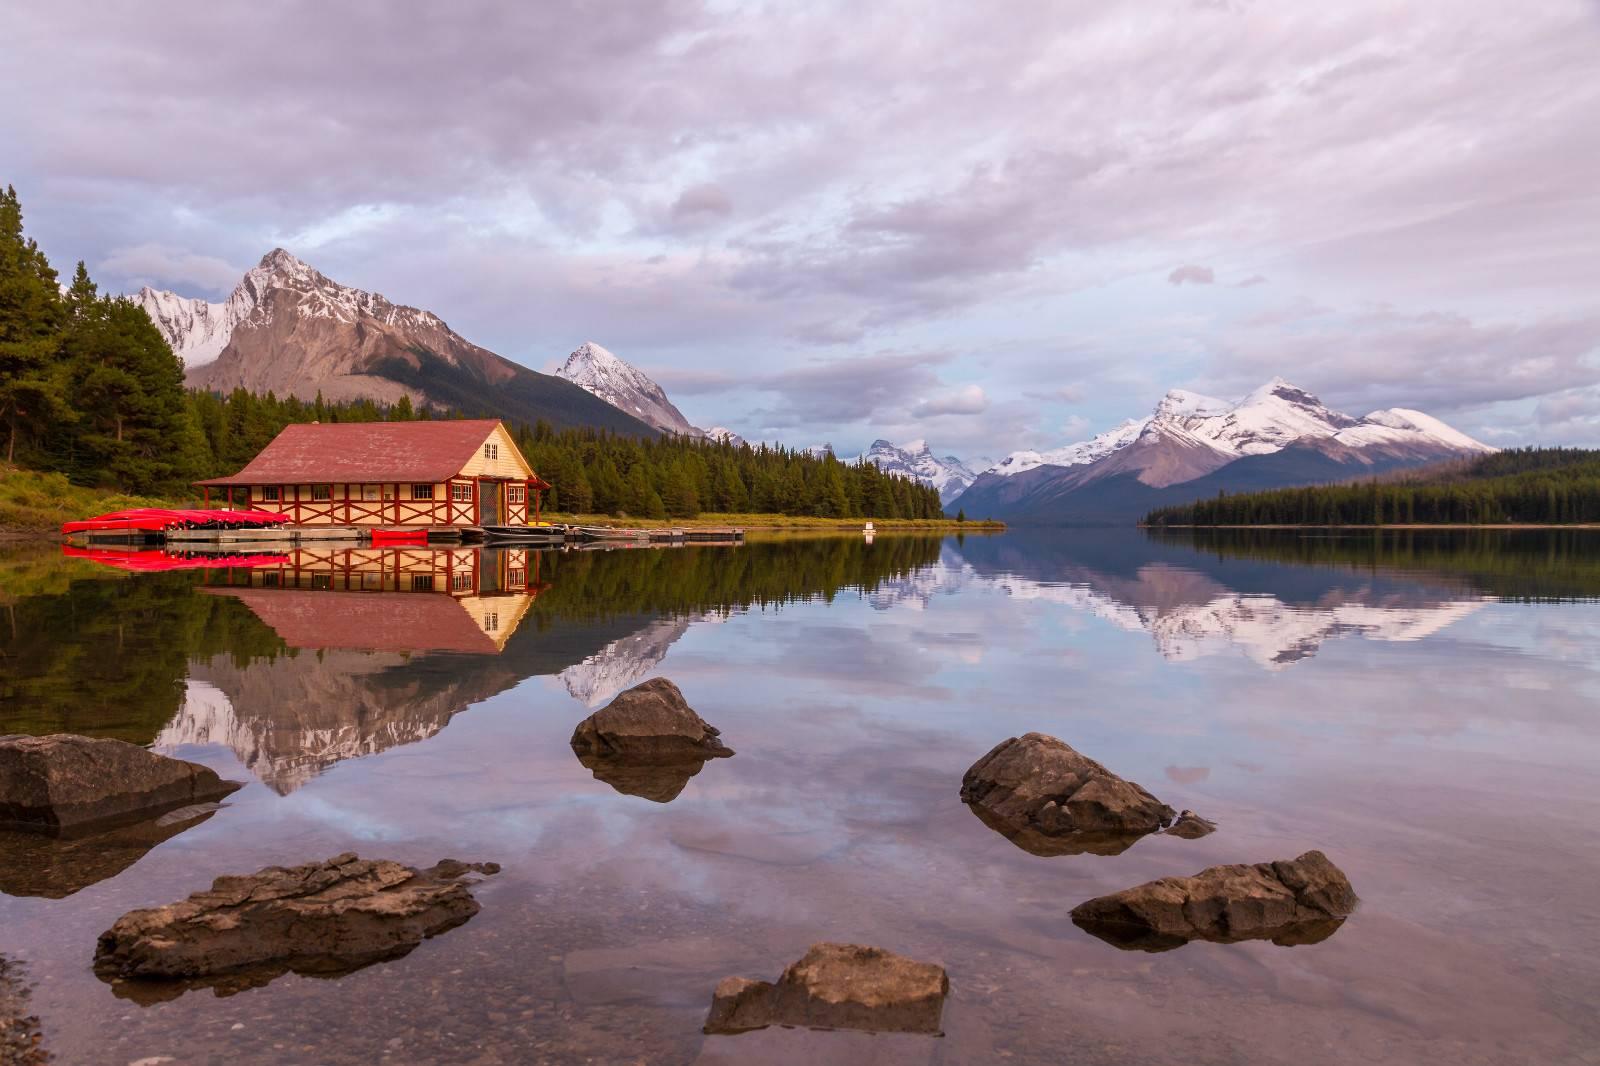 4-Day Wondrous Canadian Rockies Tour